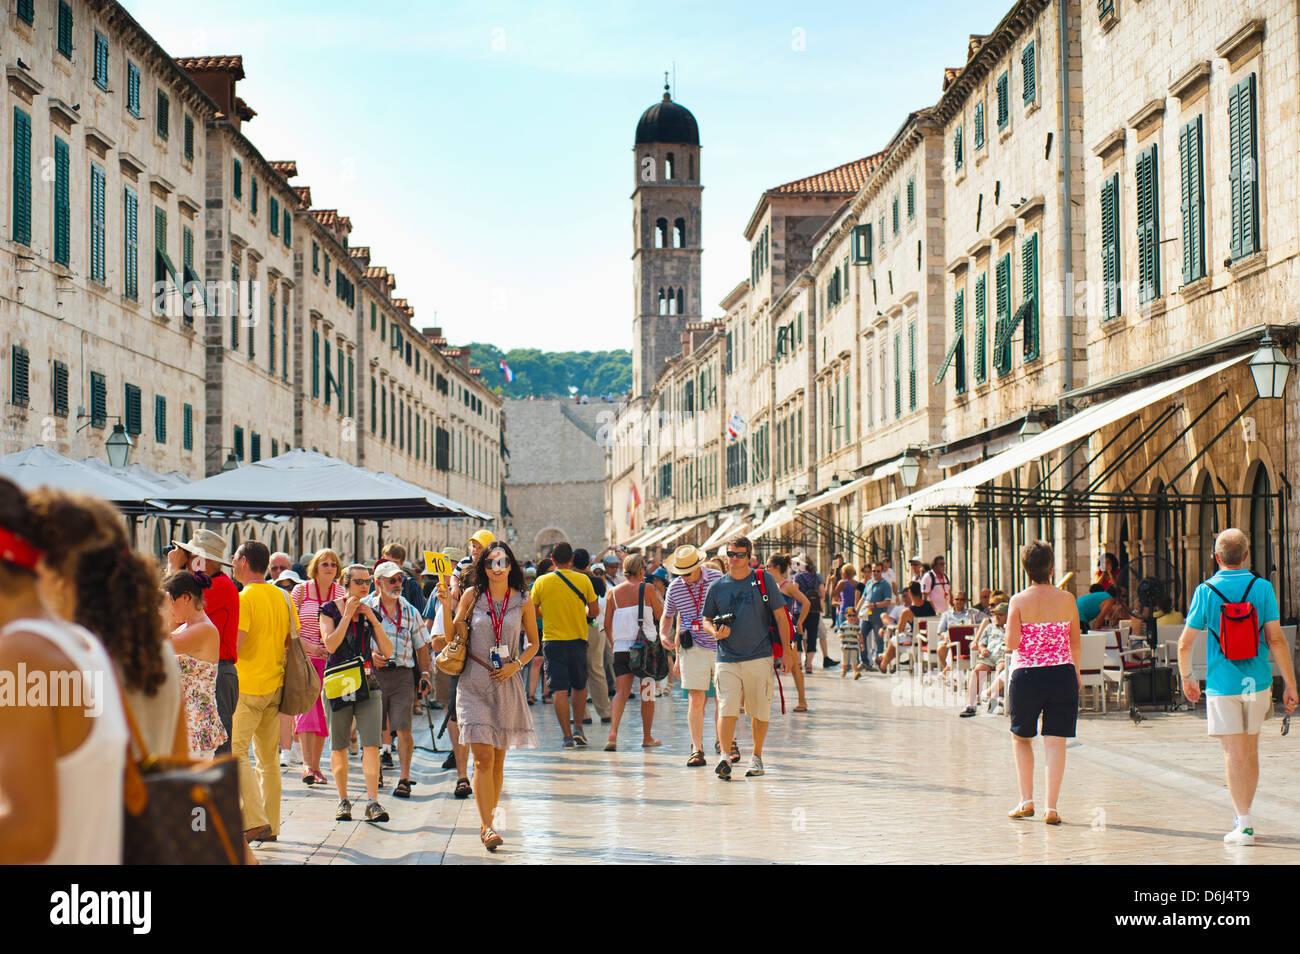 Dubrovnik City Tour on Stradun, Dubrovnik Old Town, UNESCO World Heritage Site, Dubrovnik, Croatia - Stock Image